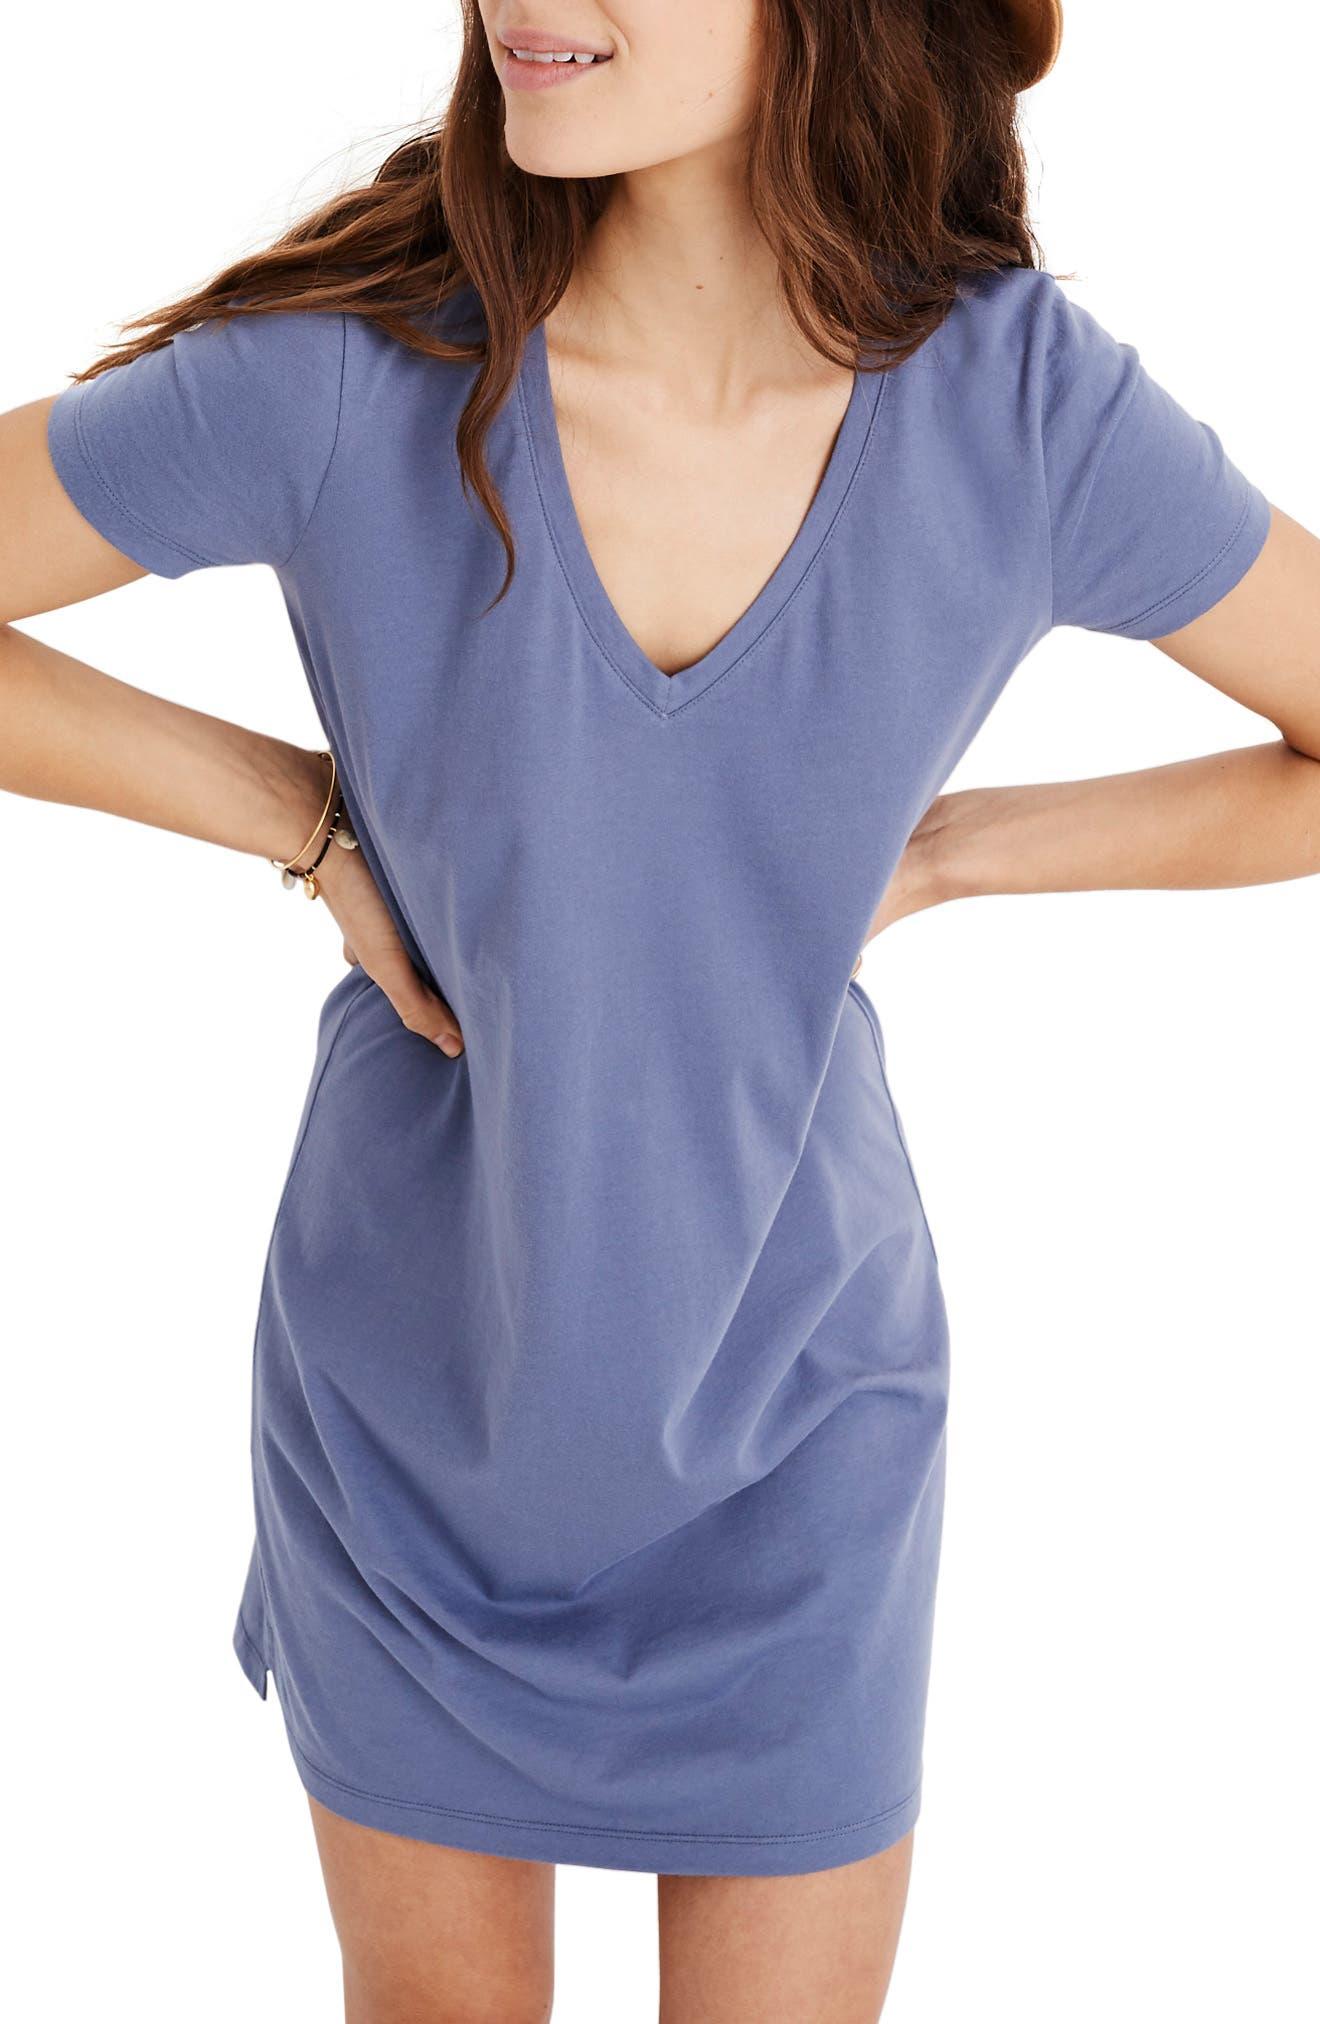 MADEWELL, Northside V-Neck T-Shirt Dress, Main thumbnail 1, color, PALE SHADOW